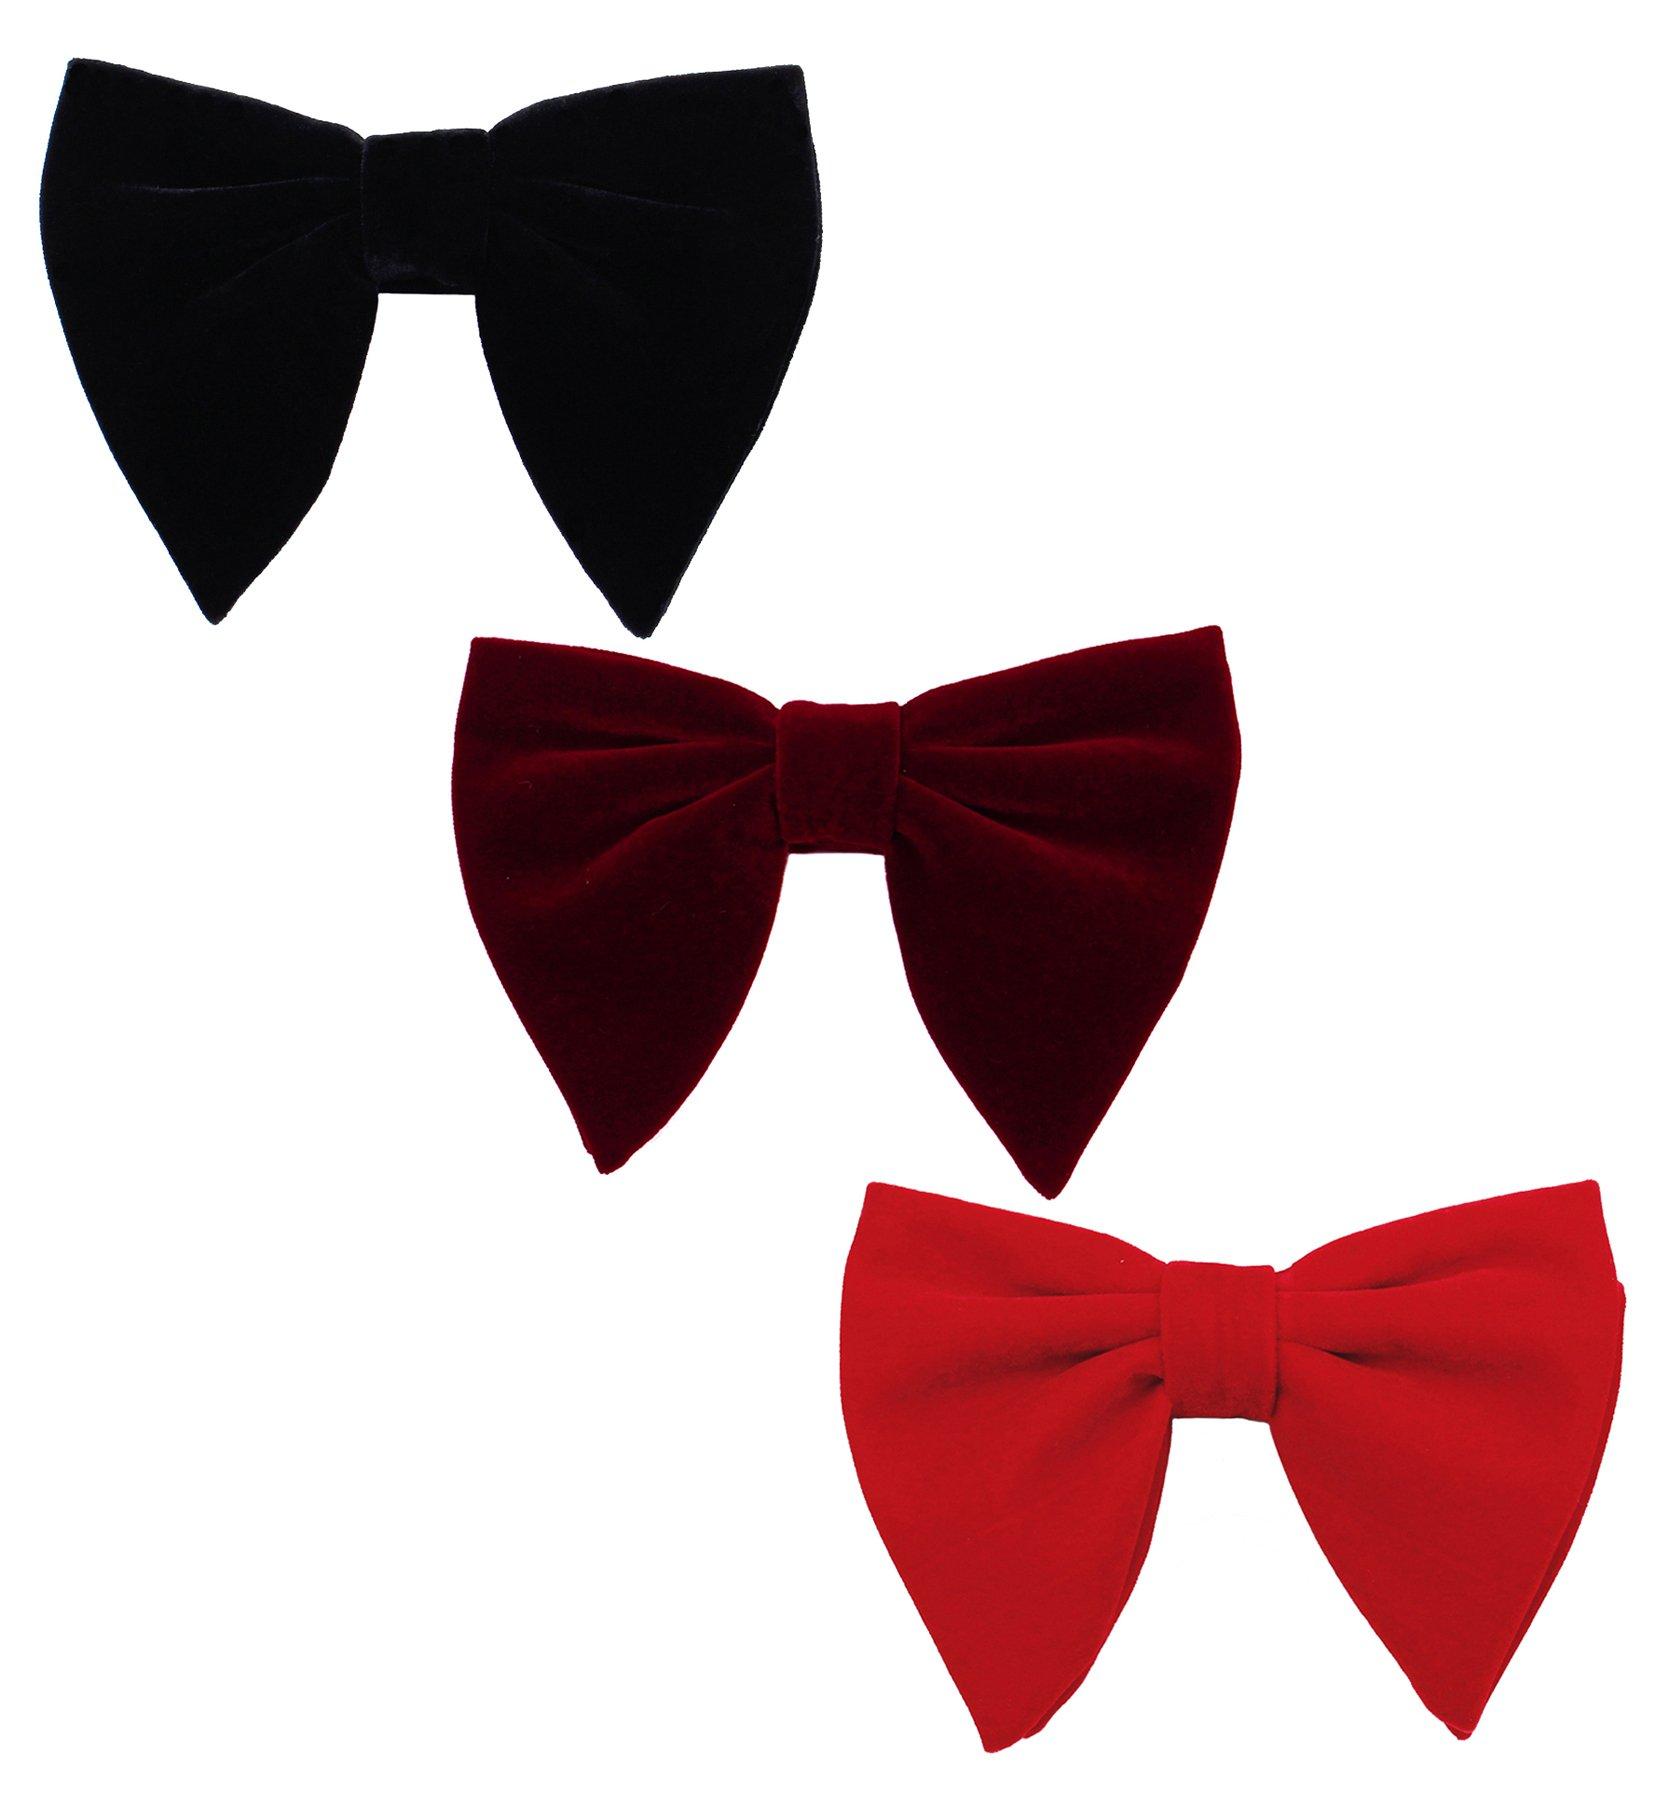 Levao Men's Velvet Vintage Bow Tie Tuxedo Big Bowtie RB002-Mix3 D,F,G